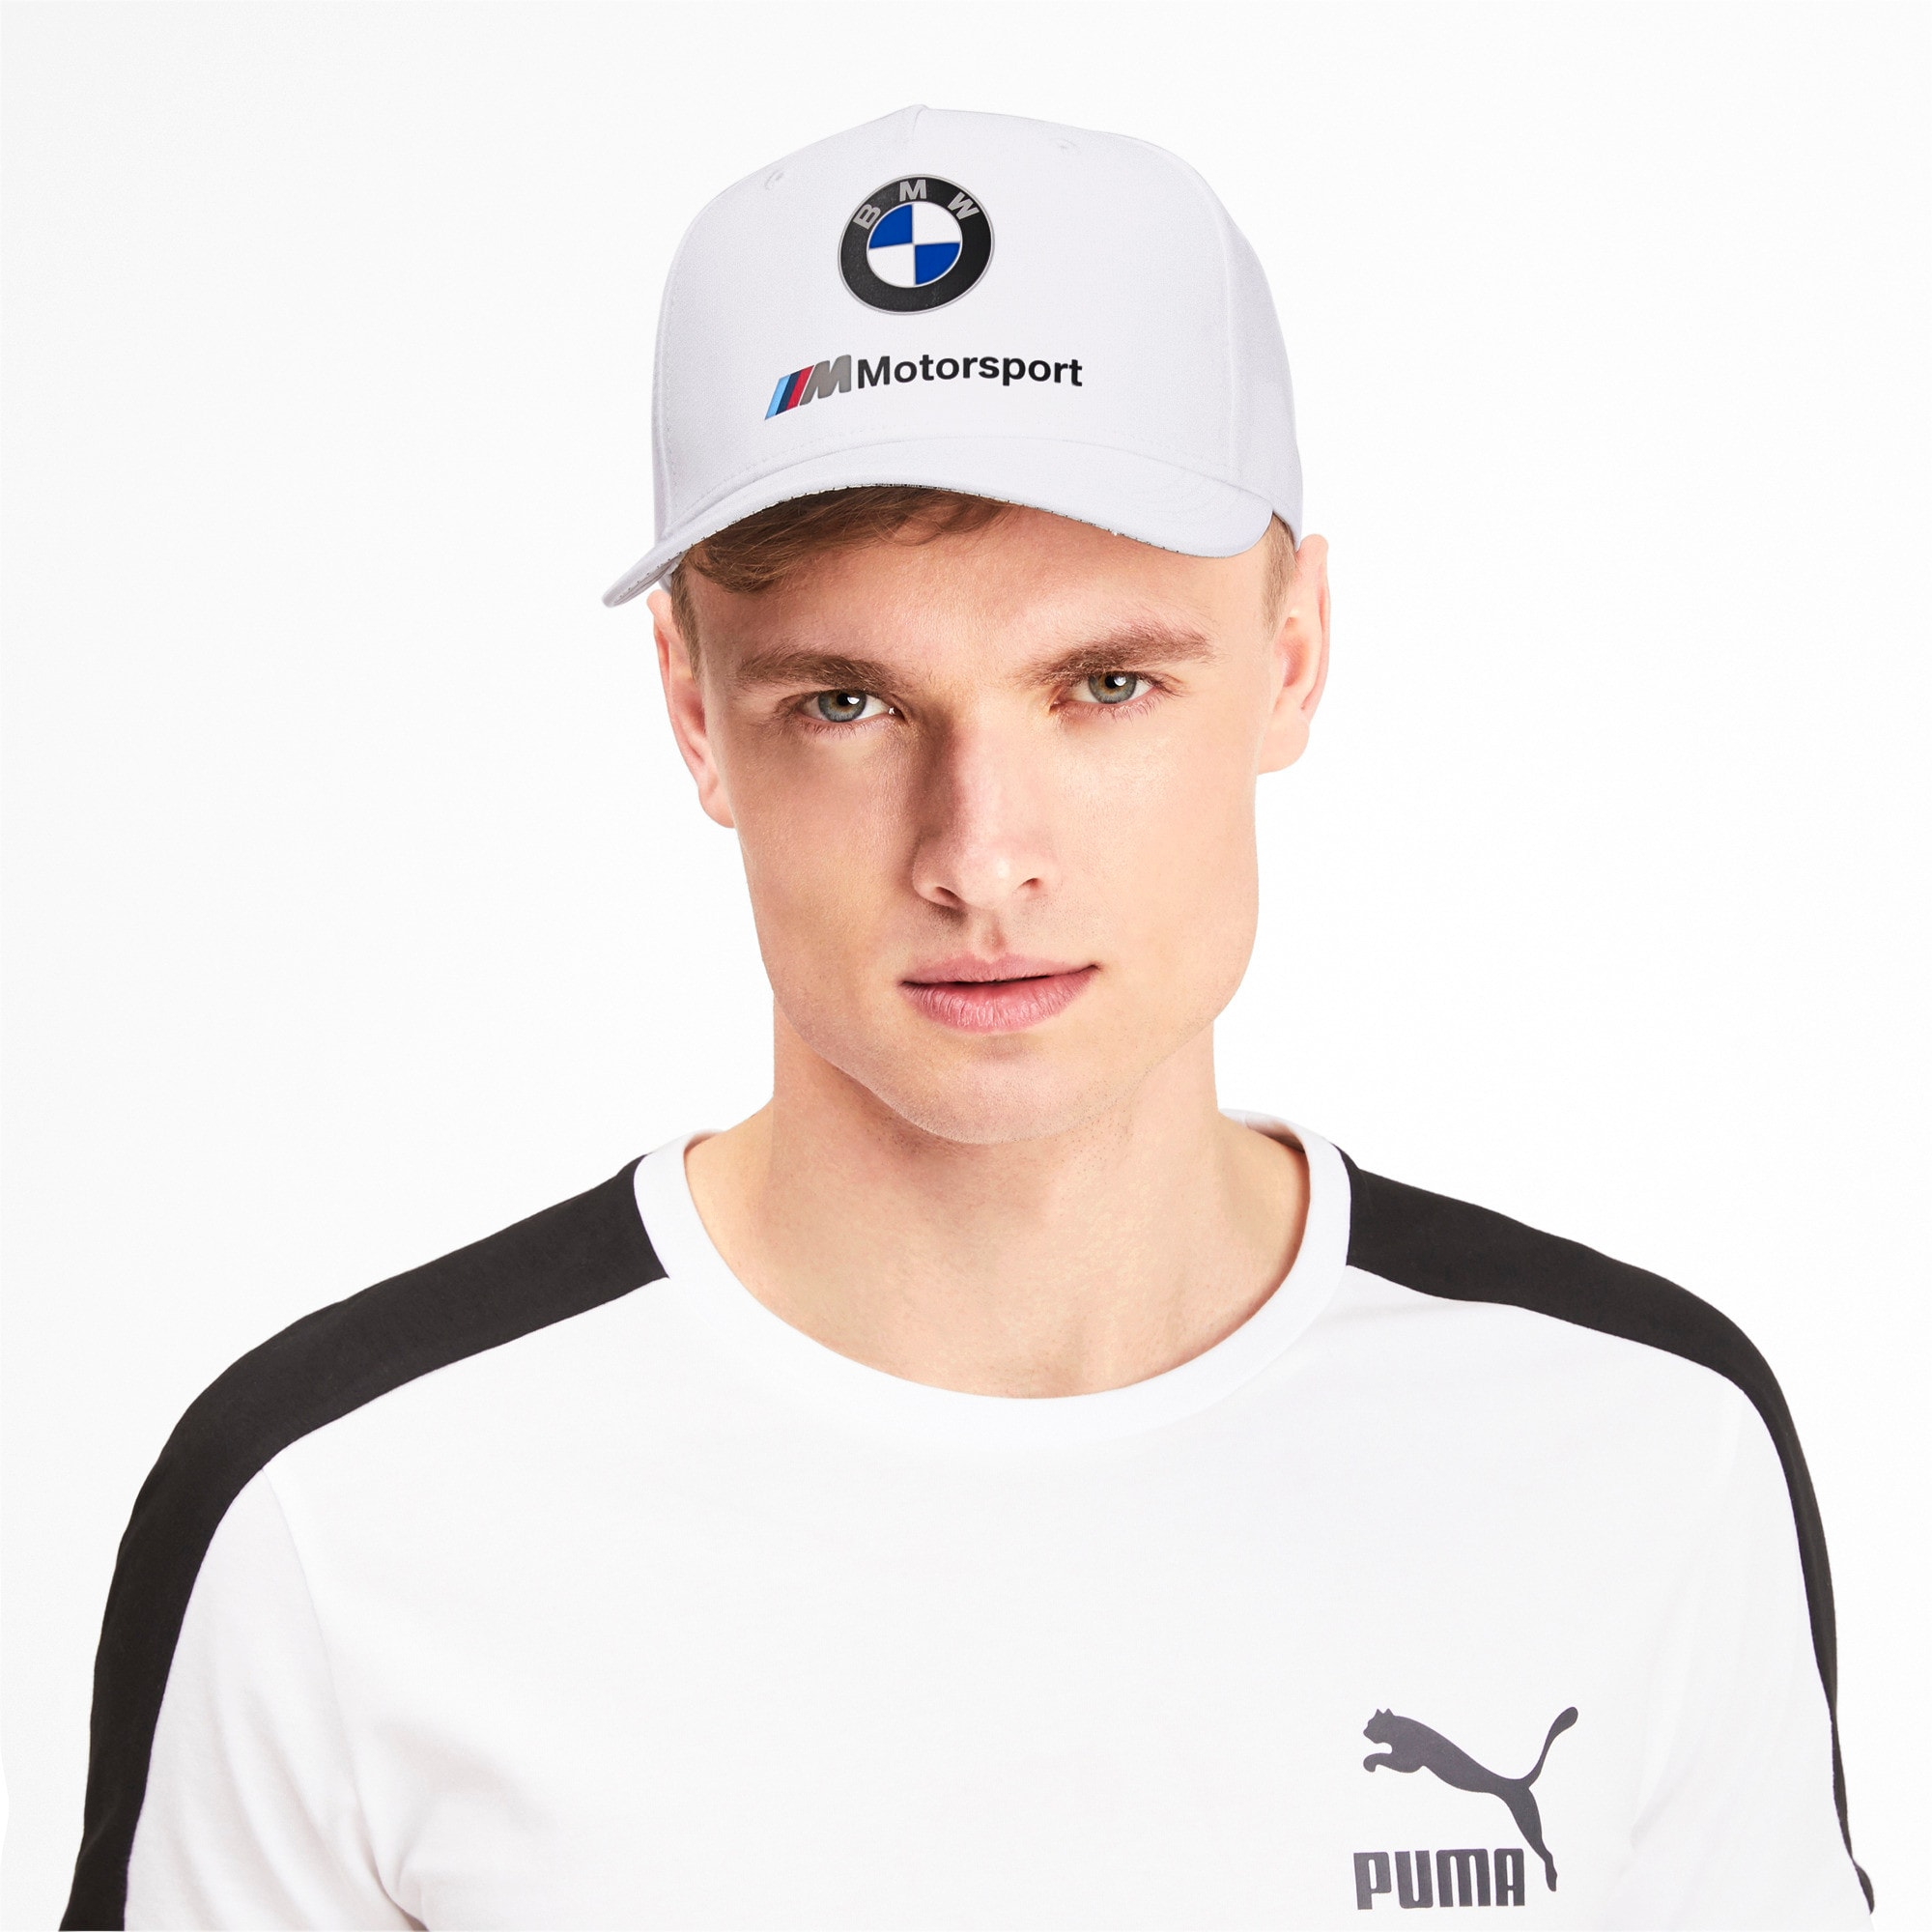 Thumbnail 2 of BMW M Motorsport Cap, Puma White, medium